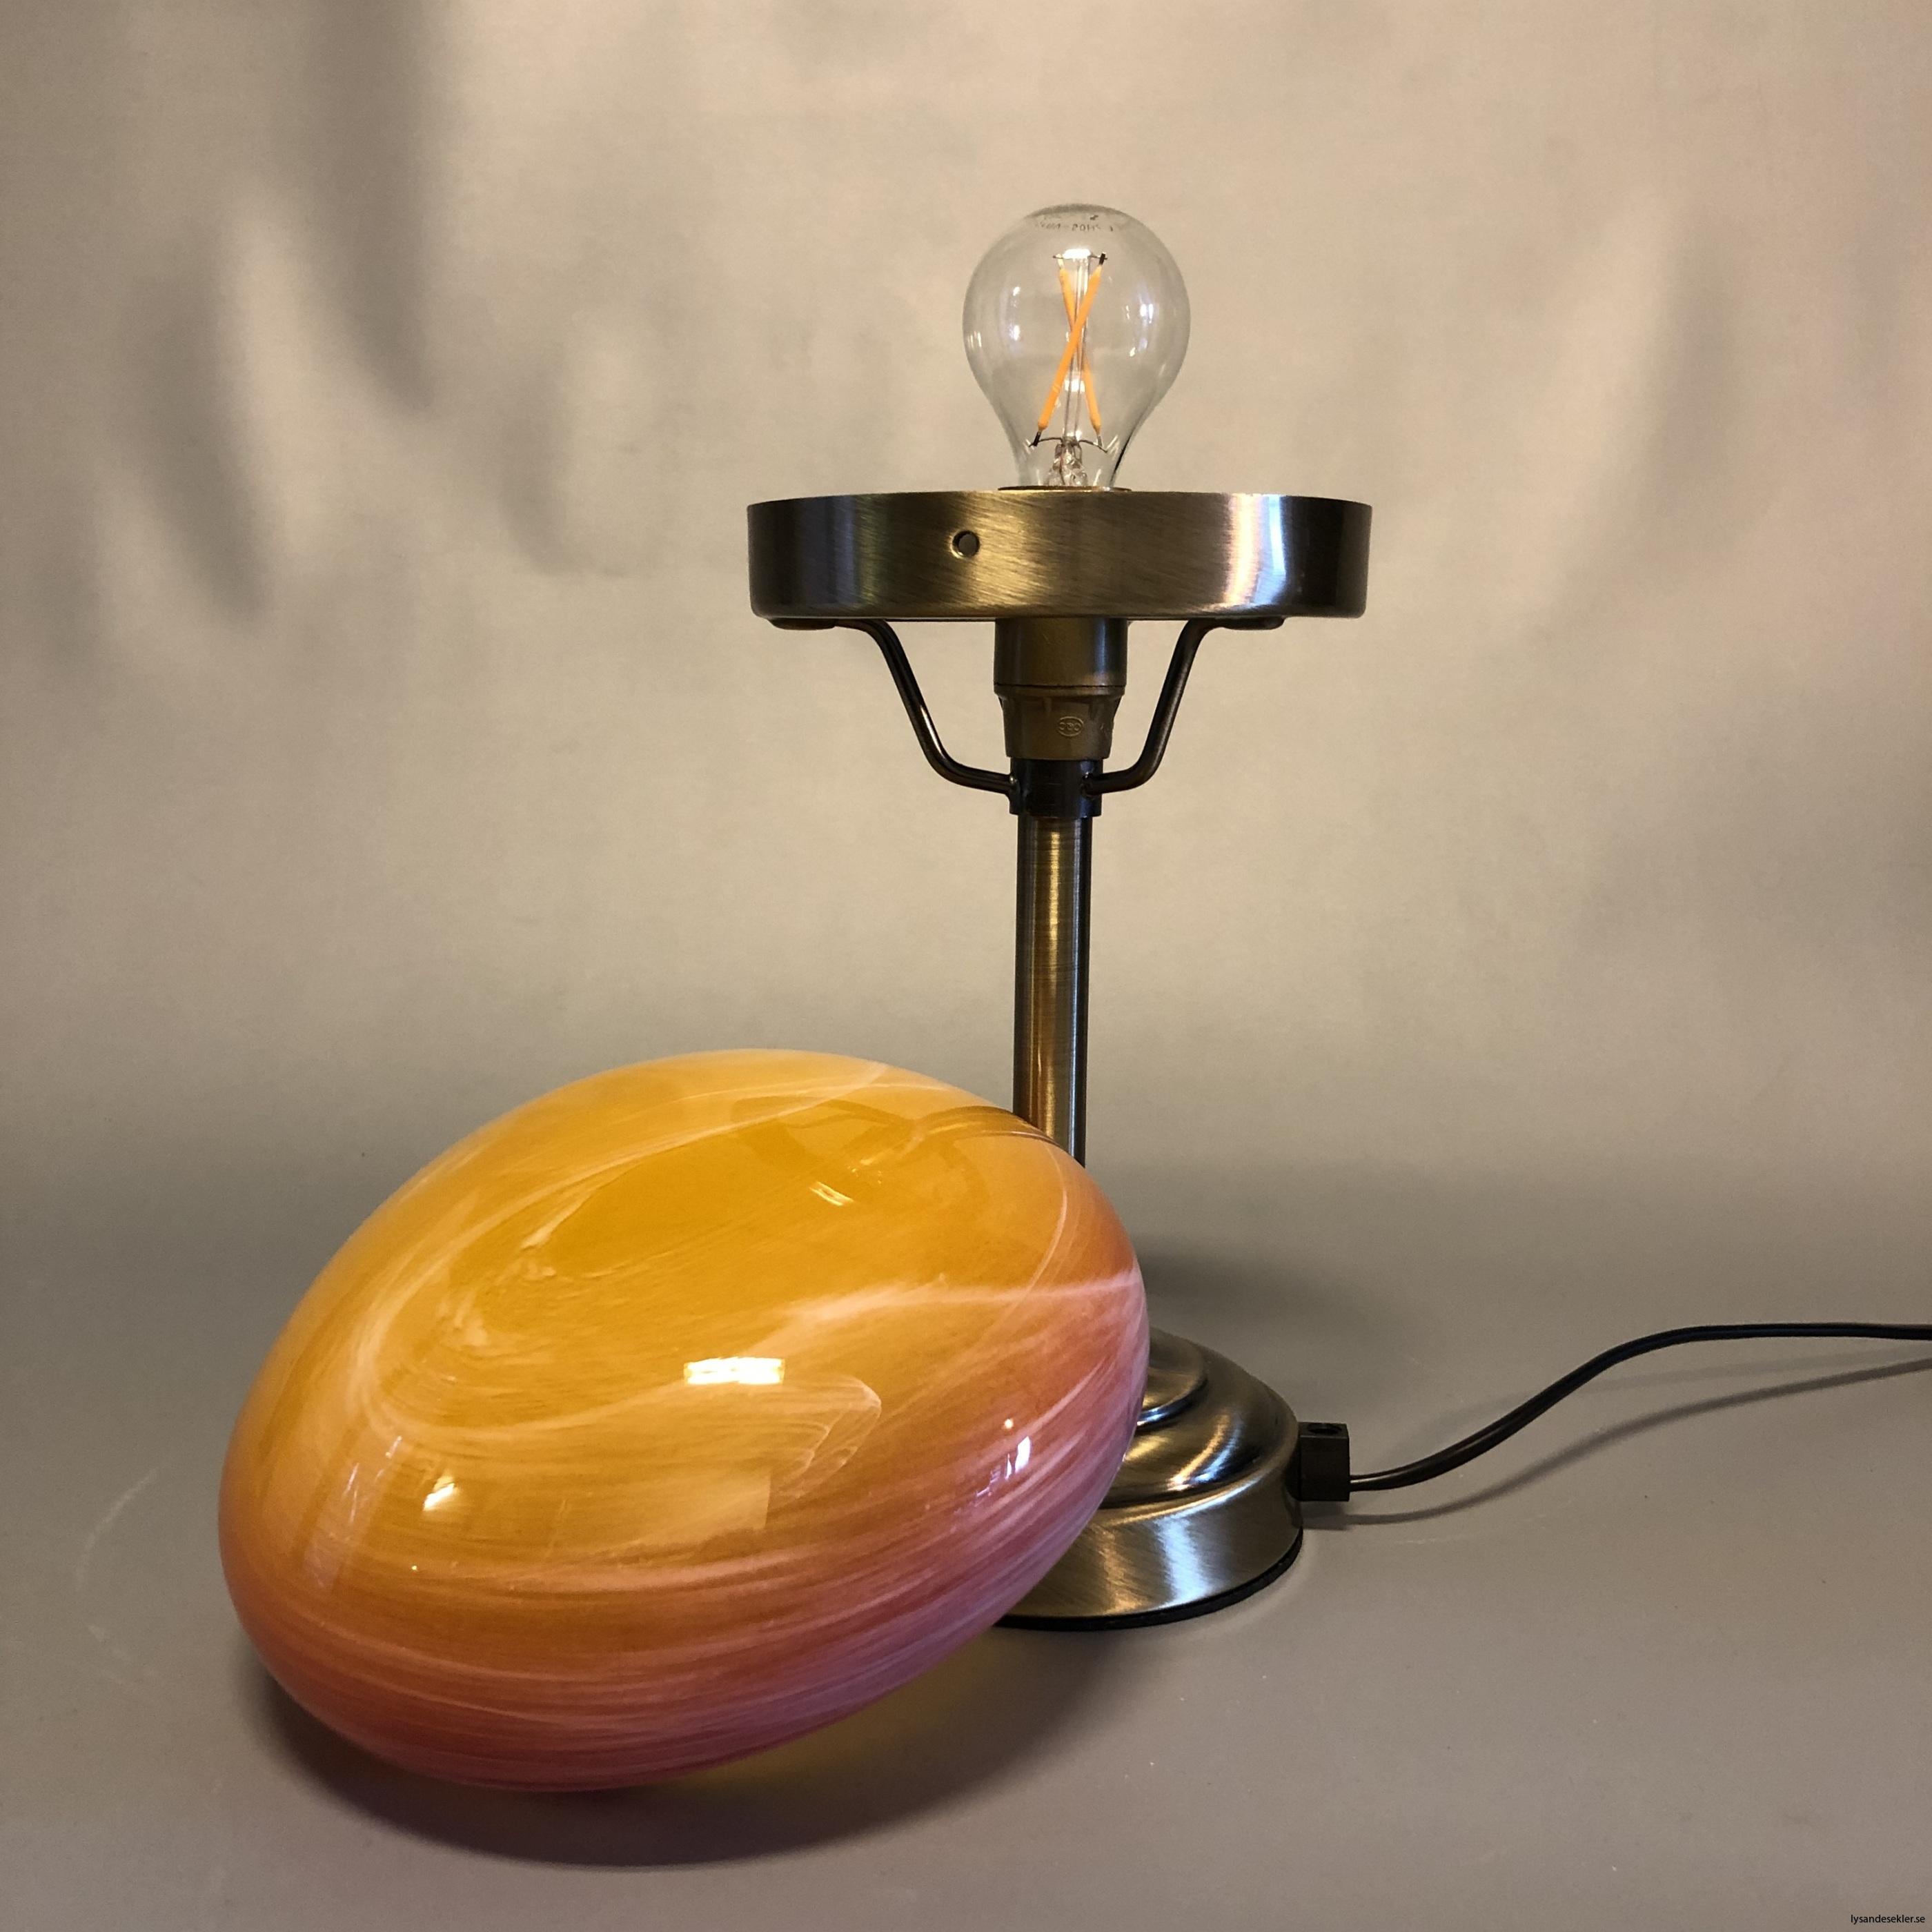 liten strindbergslampa 12 cm skärm23